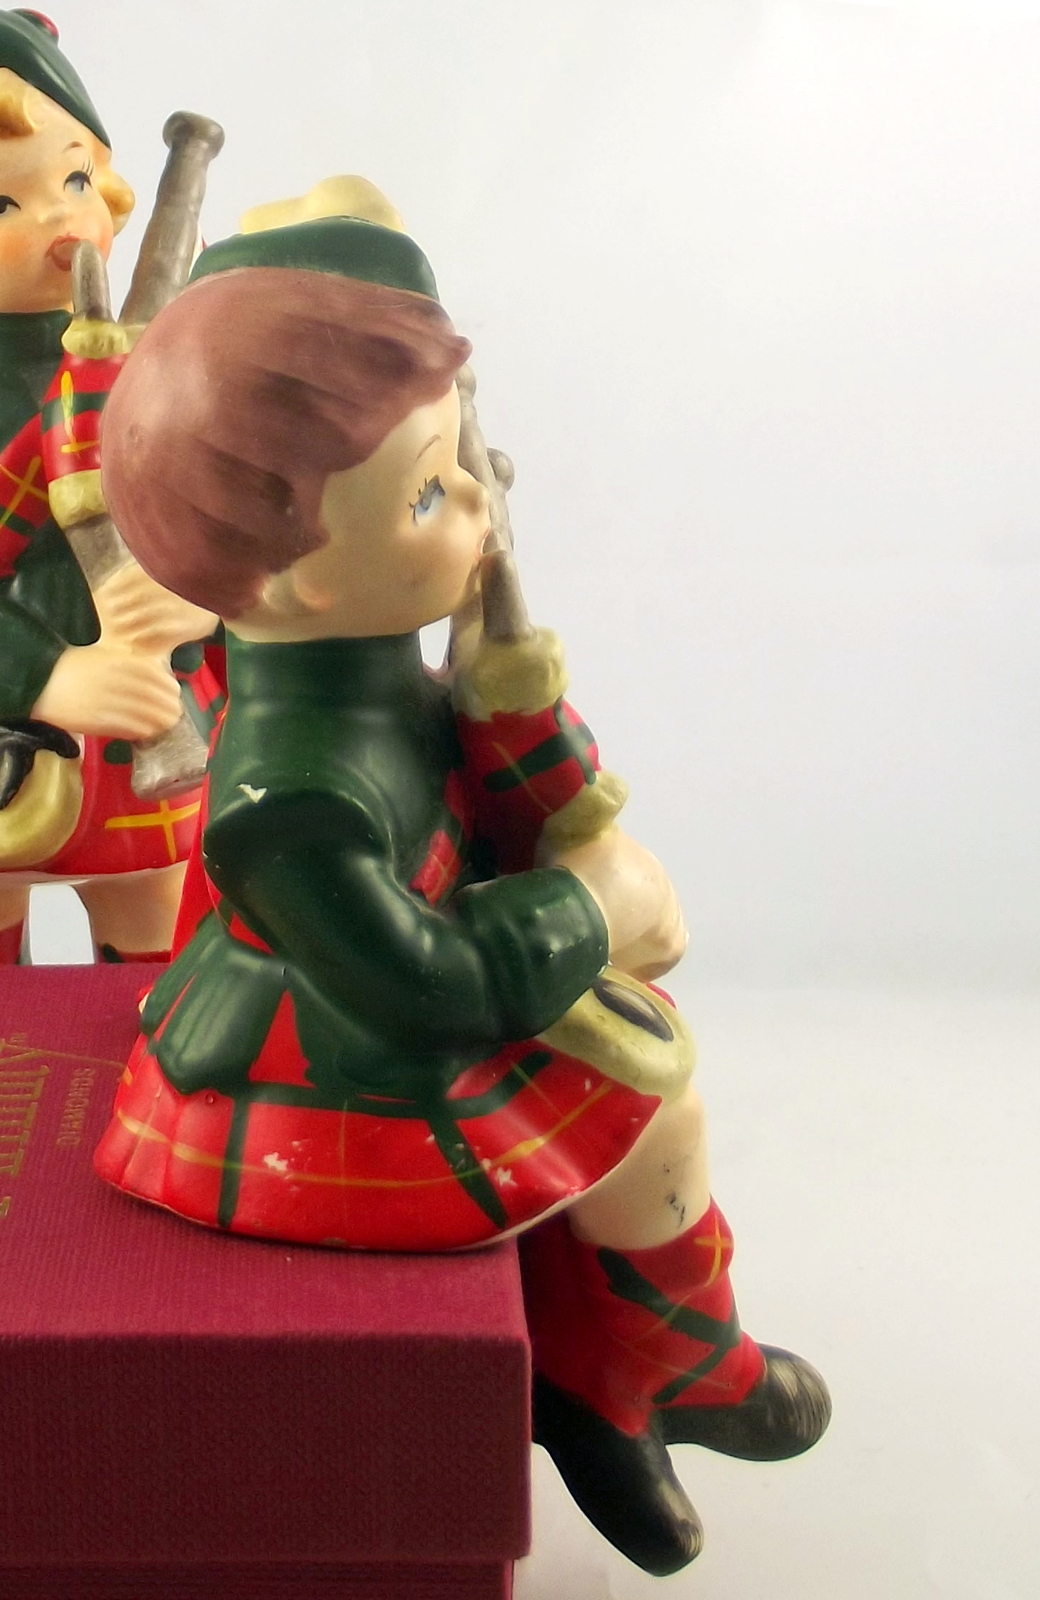 Vintage Lefton China Scottish lad lass figurines 3930 and 3931 ceramic